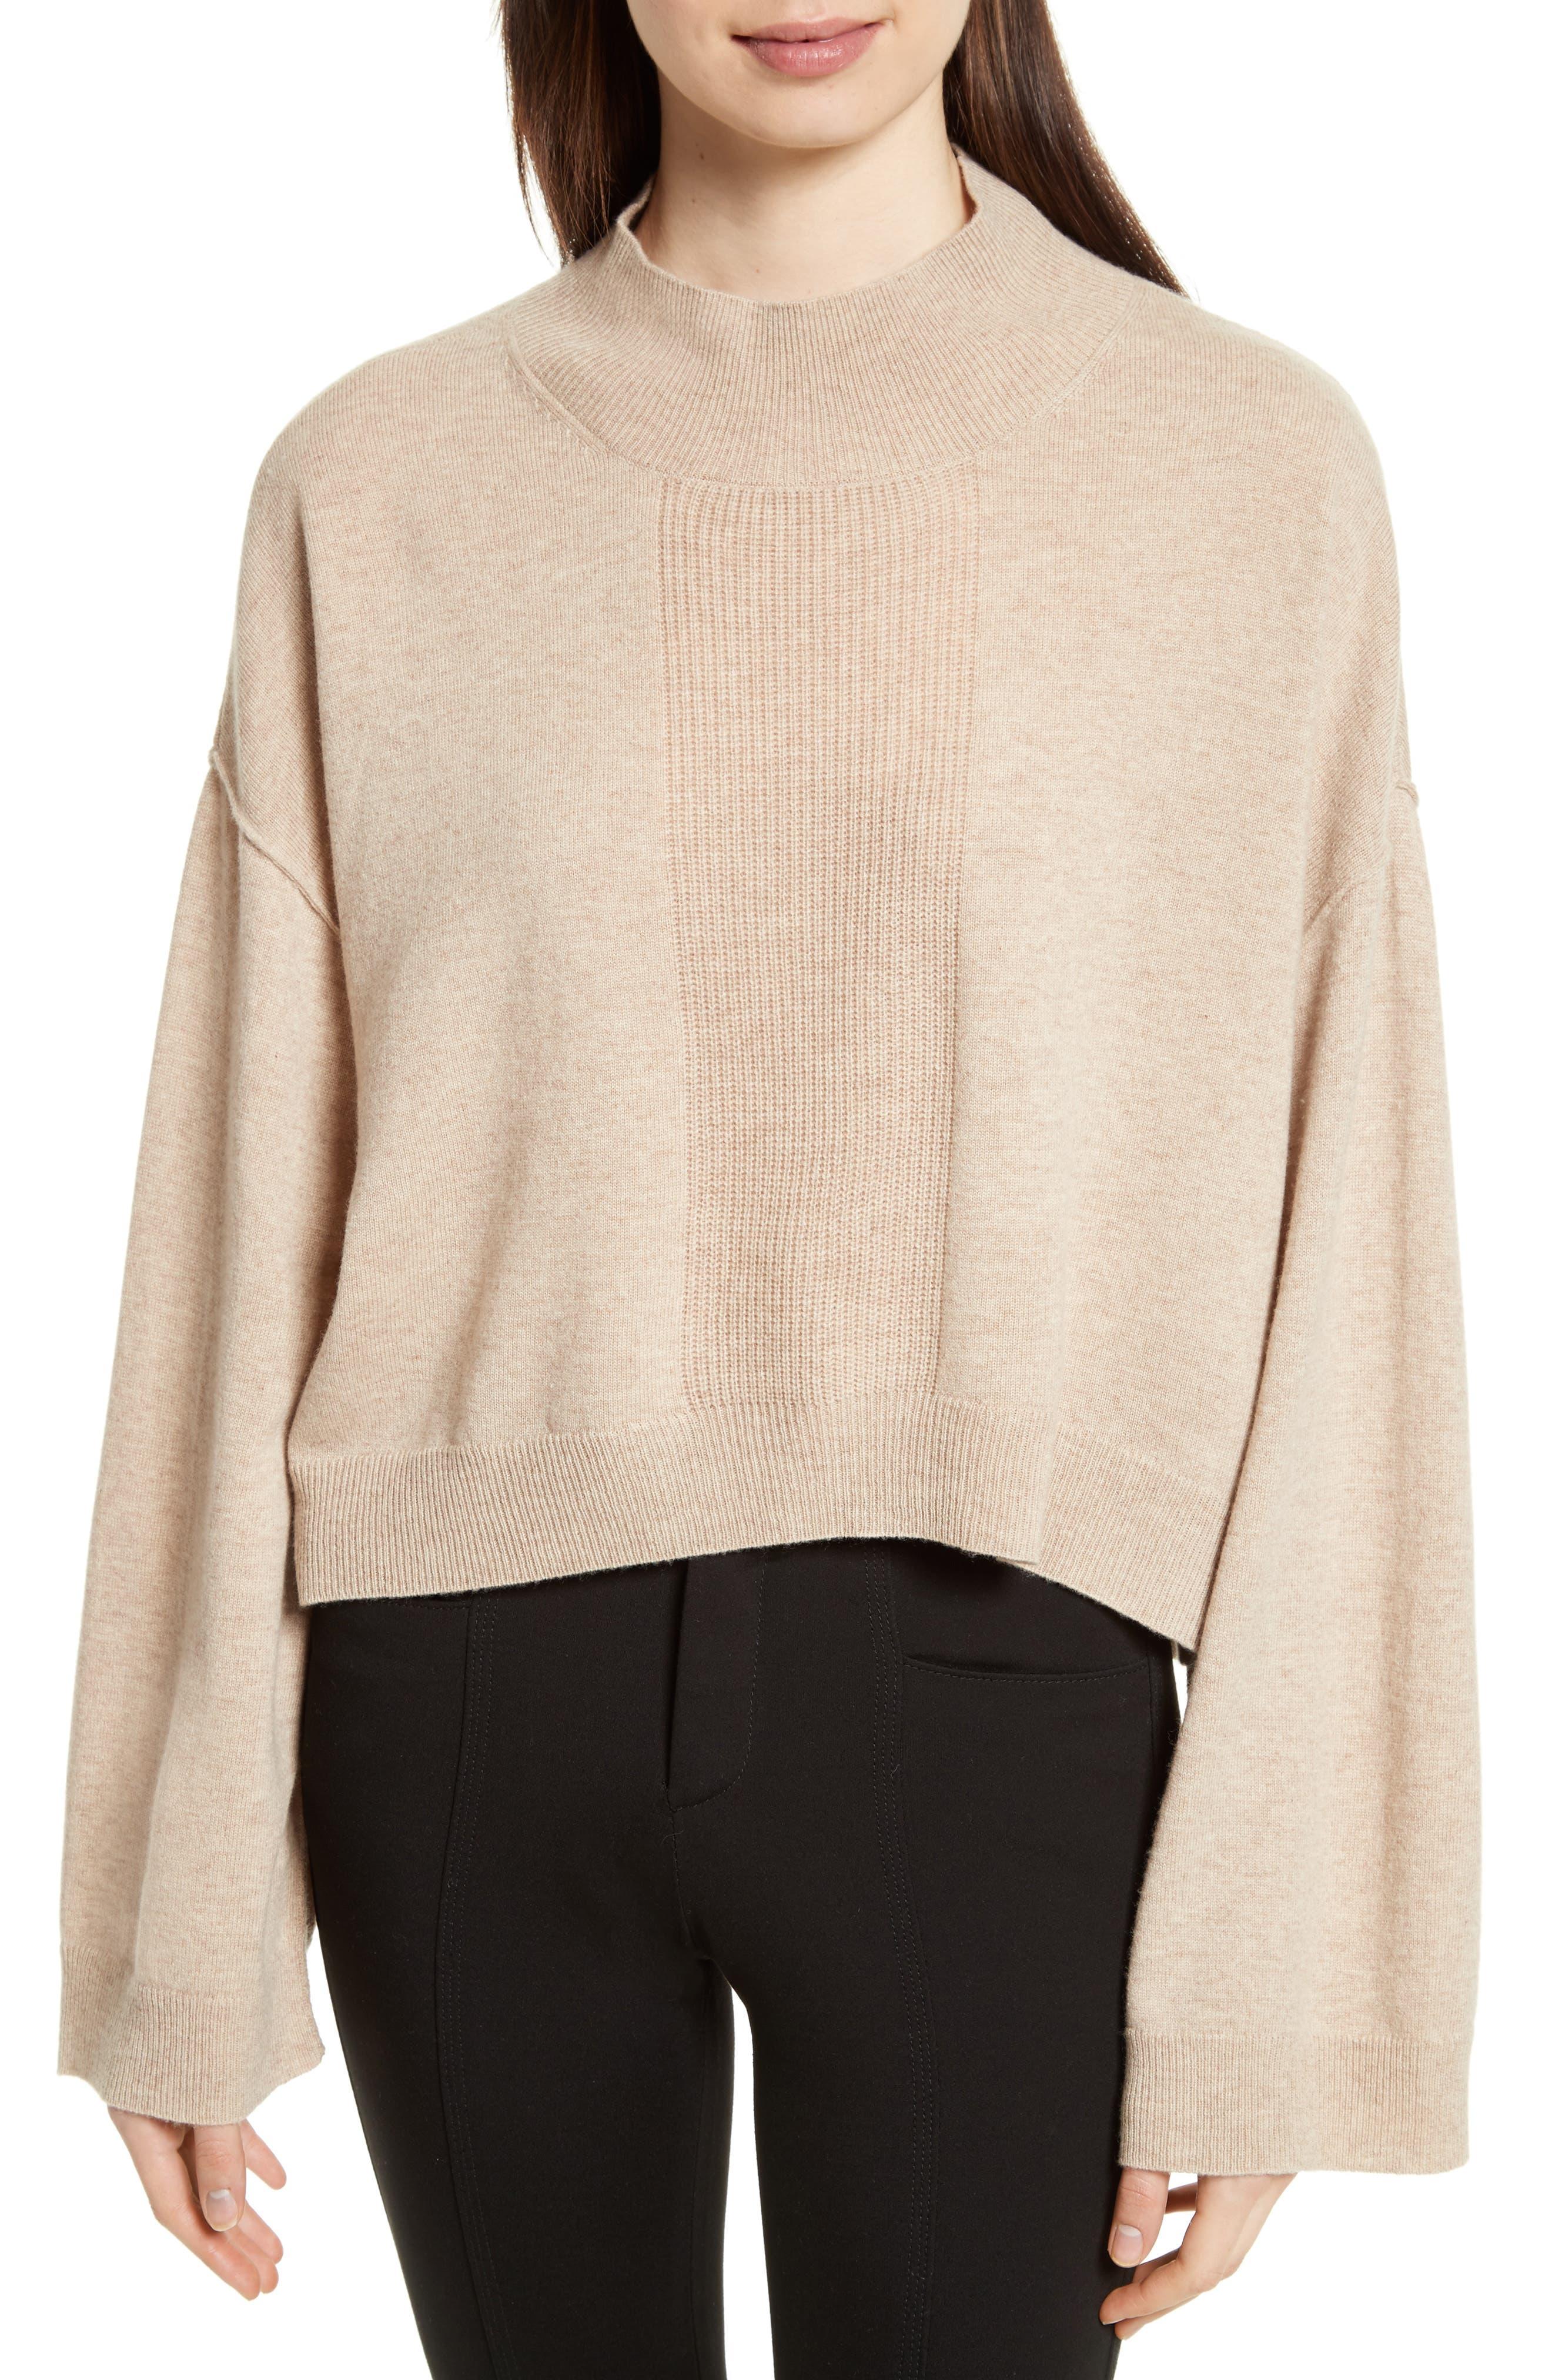 ATM Anthony Thomas Melillo Wool & Cashmere Sweater